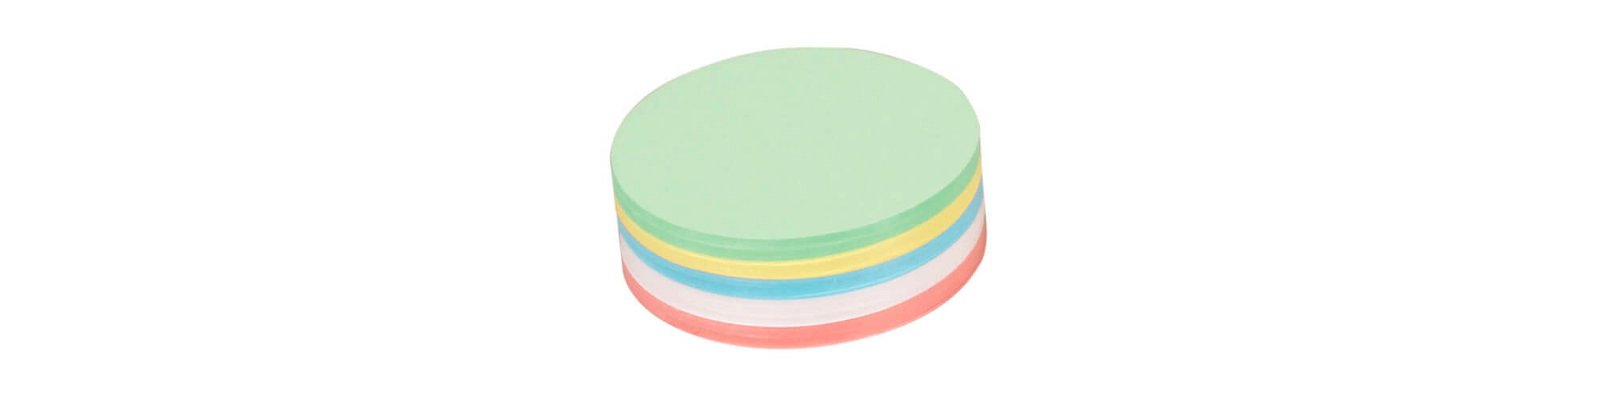 Moderationskarten, rund, Ø 9,5 cm, 250 St./Pack, farbig sortiert